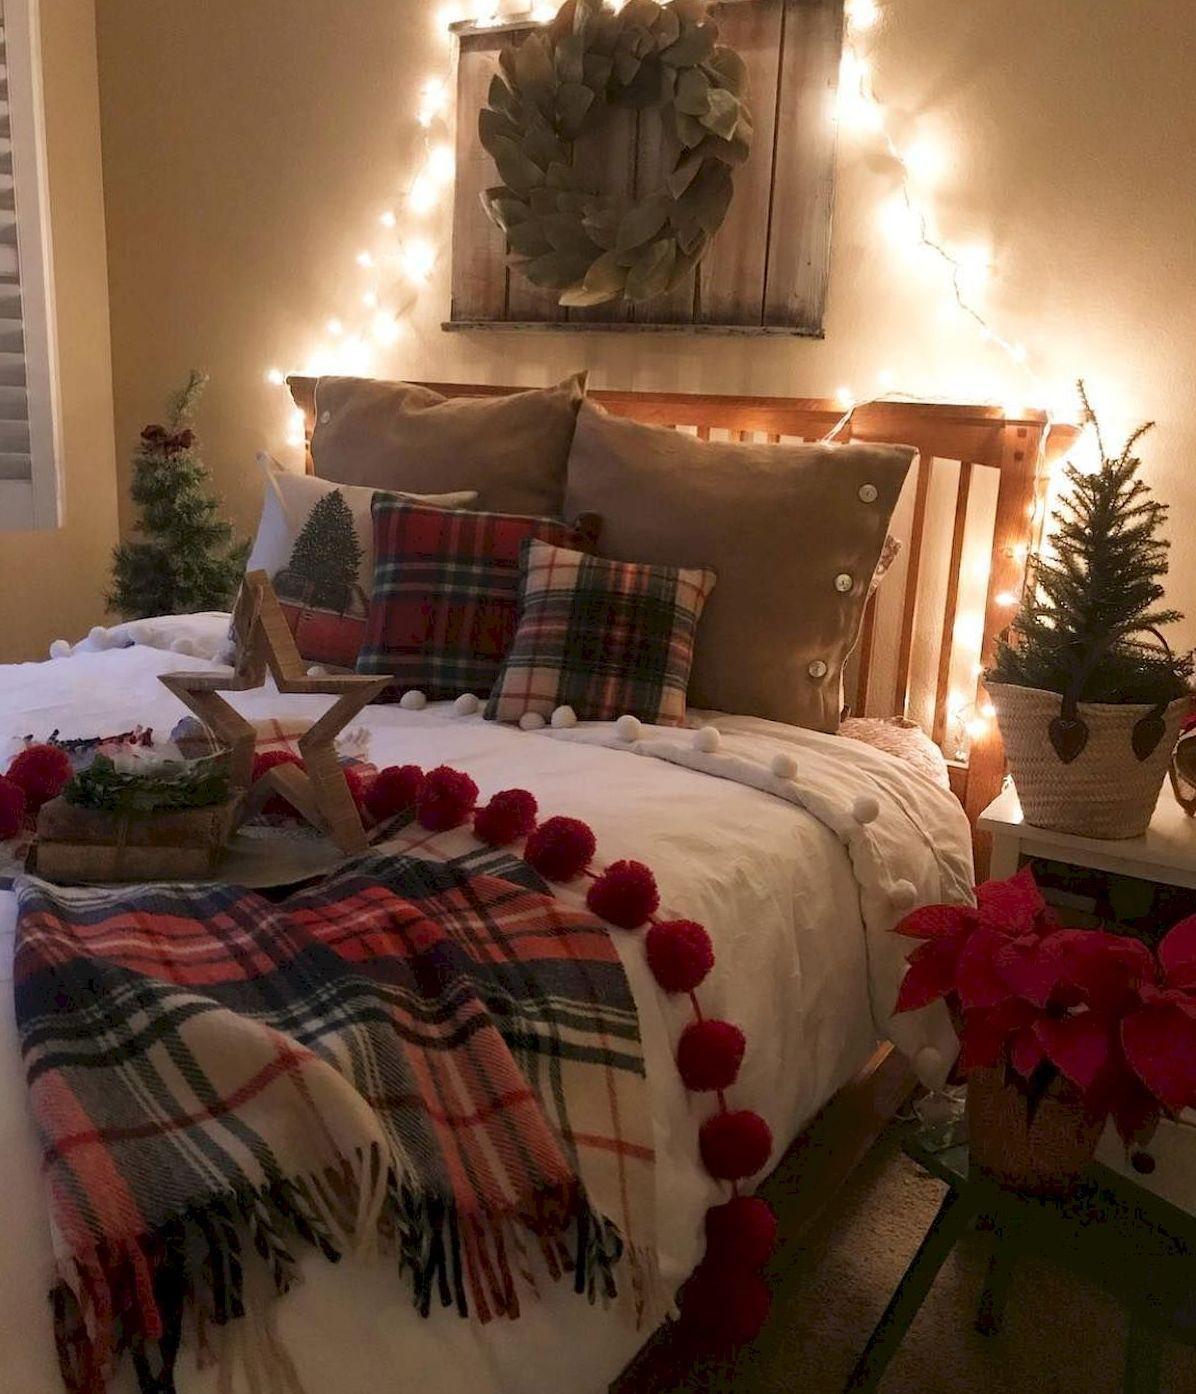 Romantic Christmas Themed Bedroom Https Hajarfresh Com Romantic Christmas Themed Bedroom Christmas Decorations Bedroom Christmas Room Decor Christmas Bedroom A cozy christmas bedroom